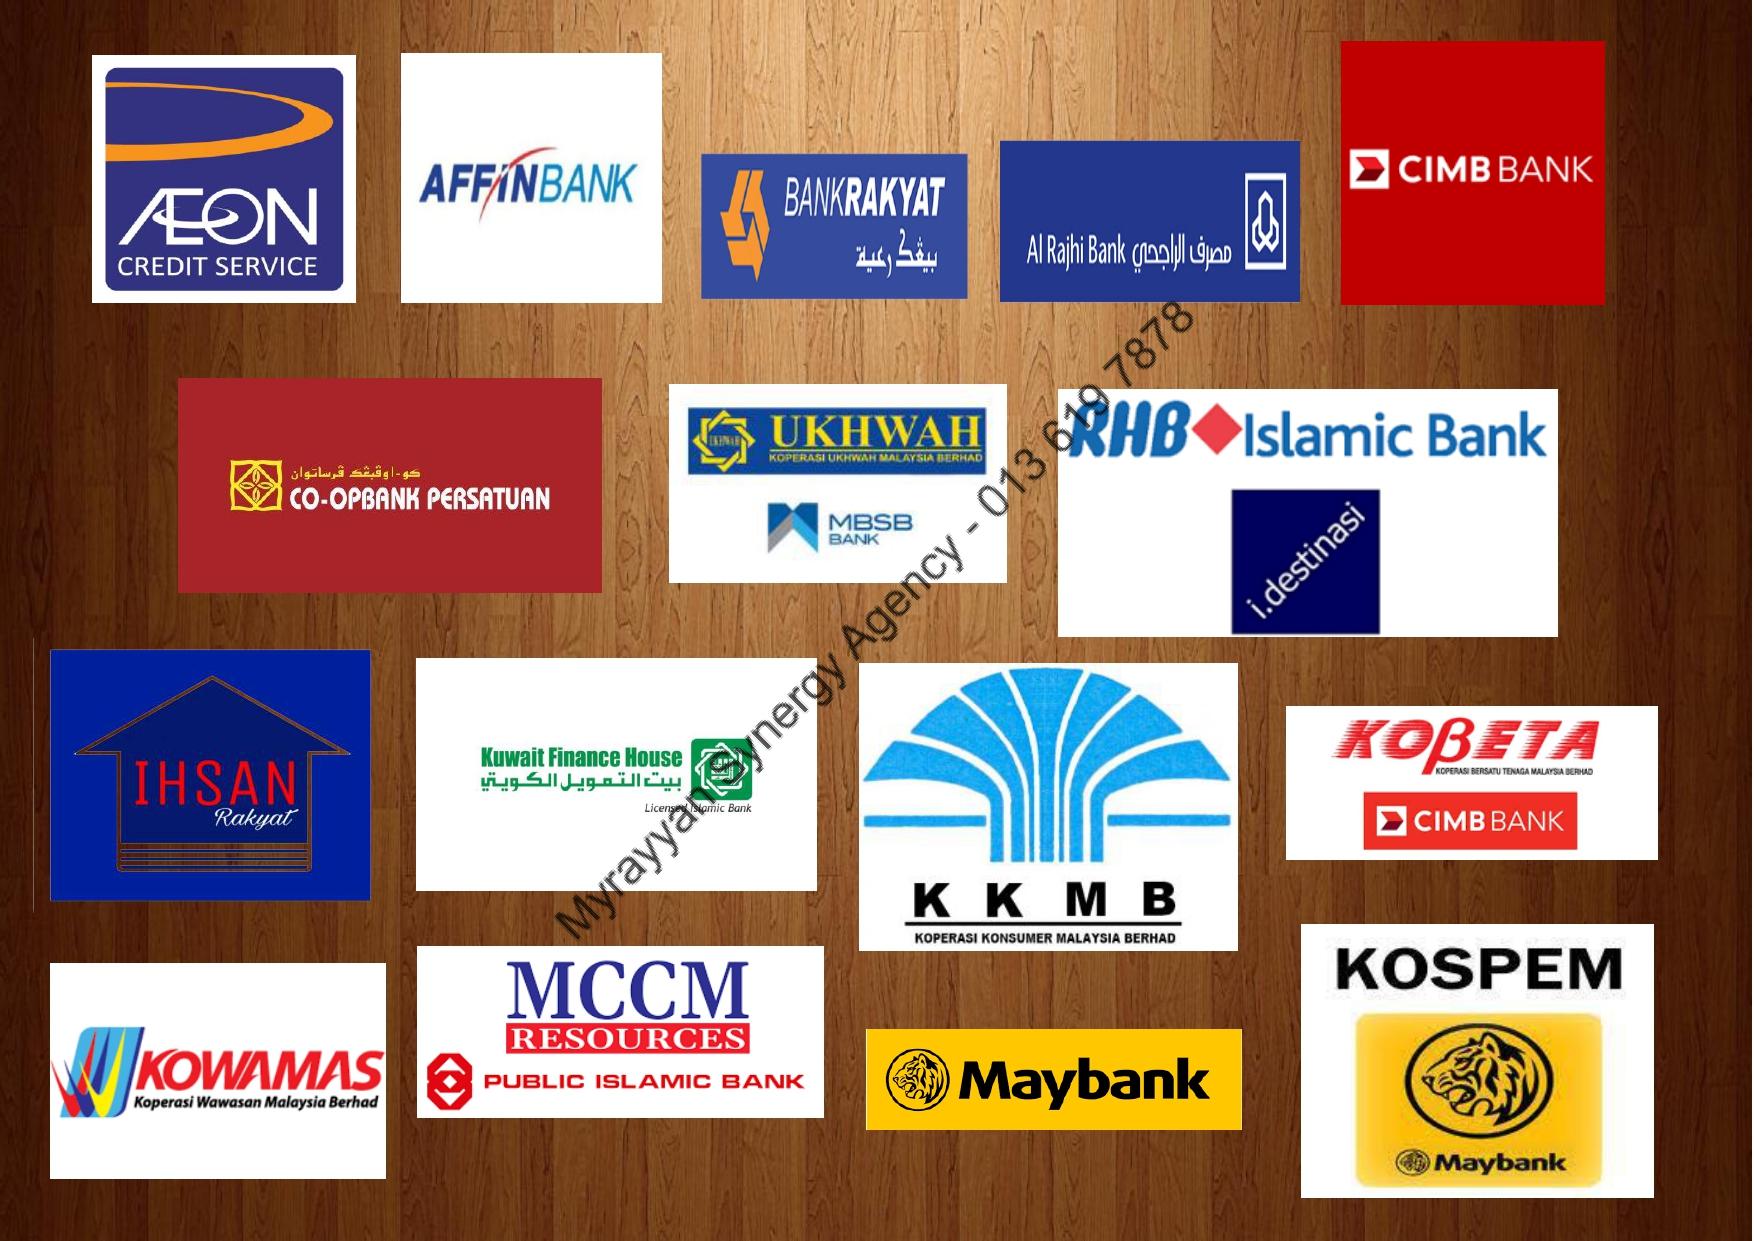 banner iklan_watermark(1)_page-0001.jpg